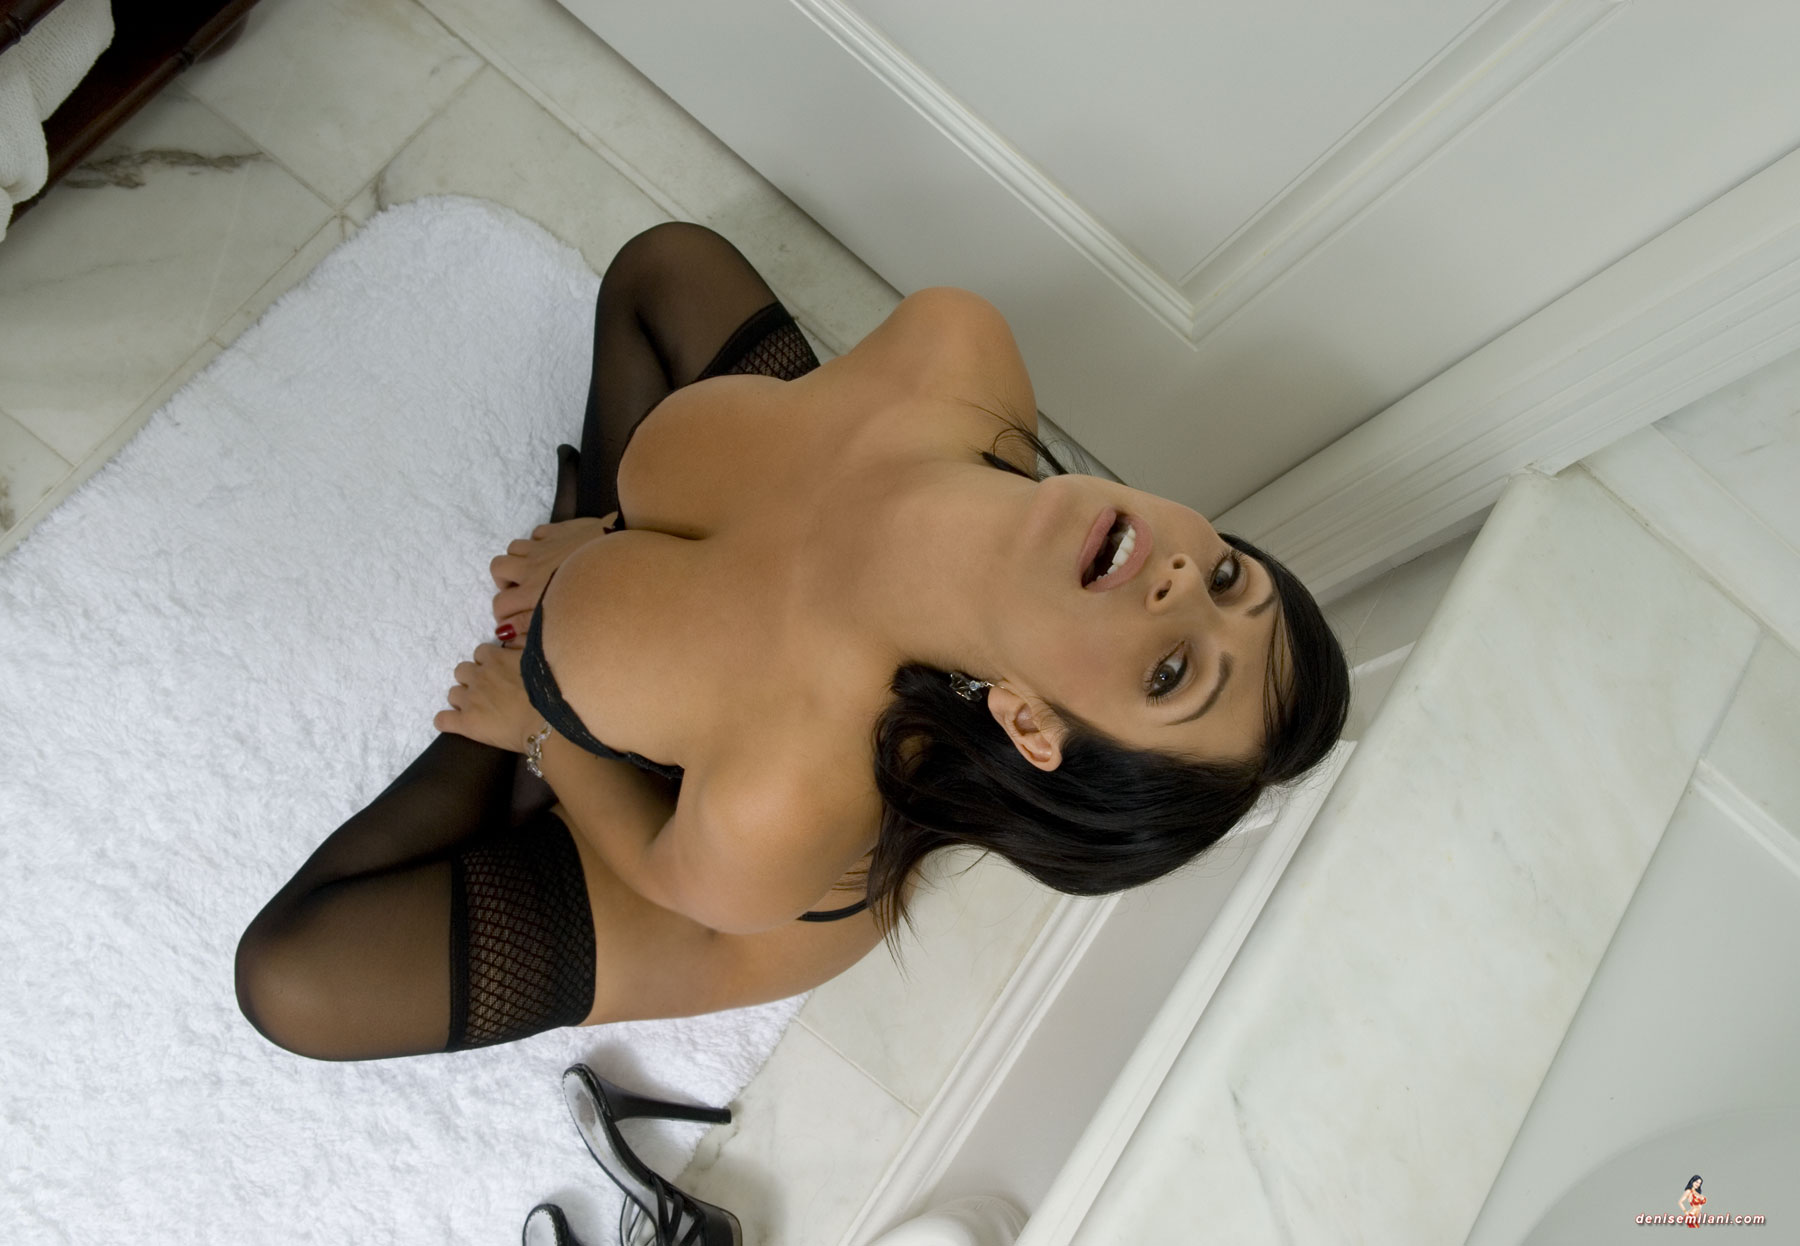 Denise Milani | Black Lngerie